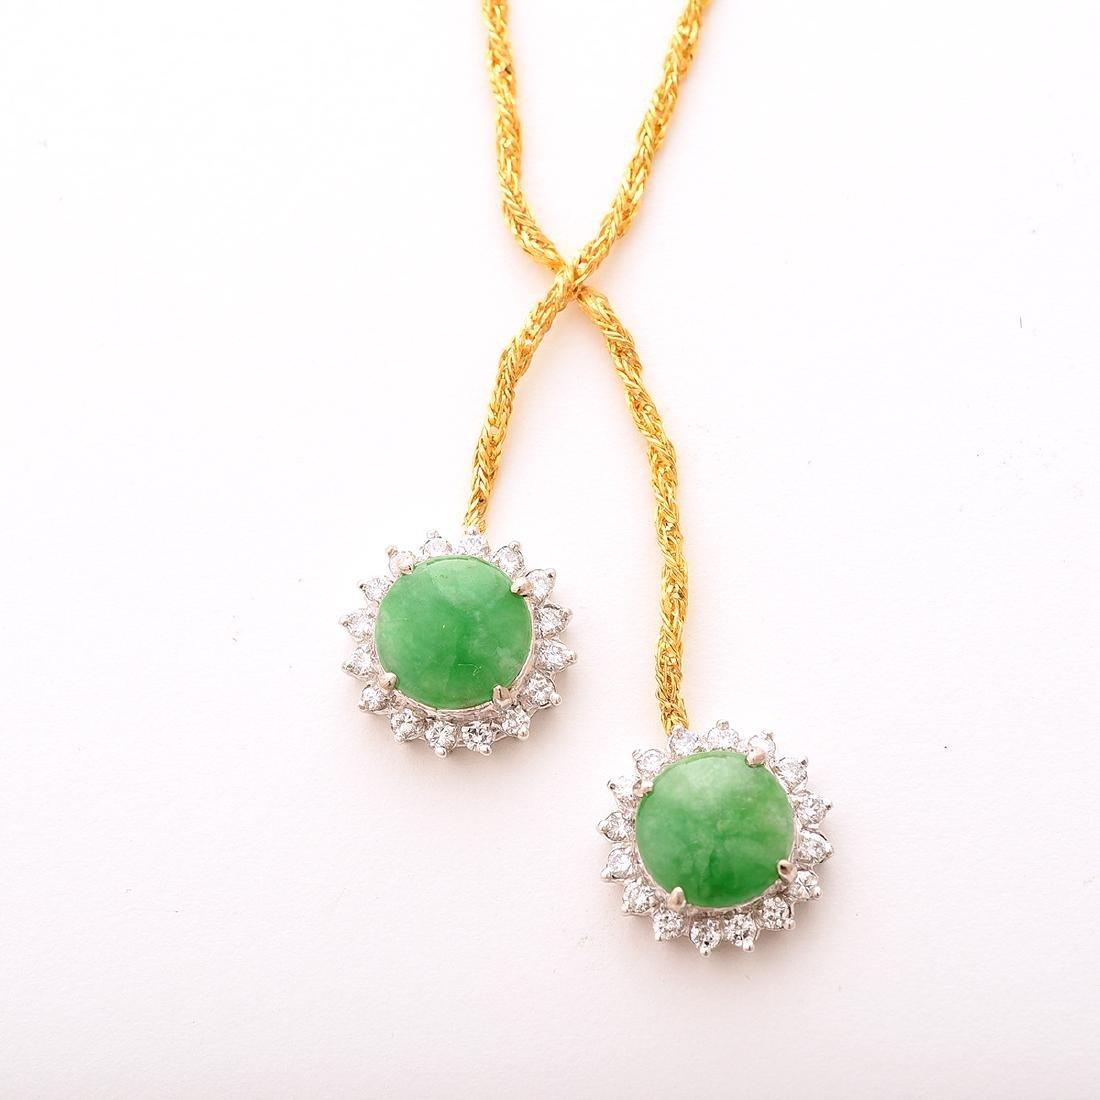 Jade, Diamond, 14k Gold Necklace. - 2